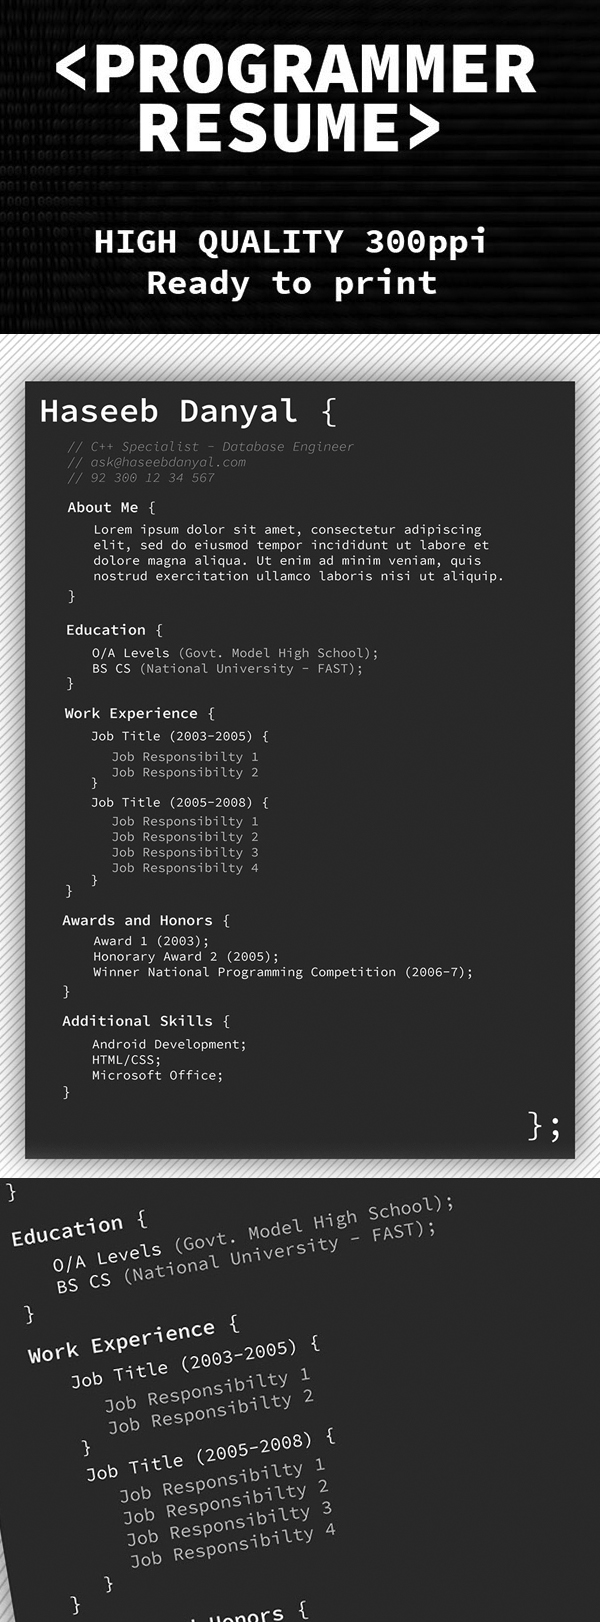 minimal+cv+resume+templates+009